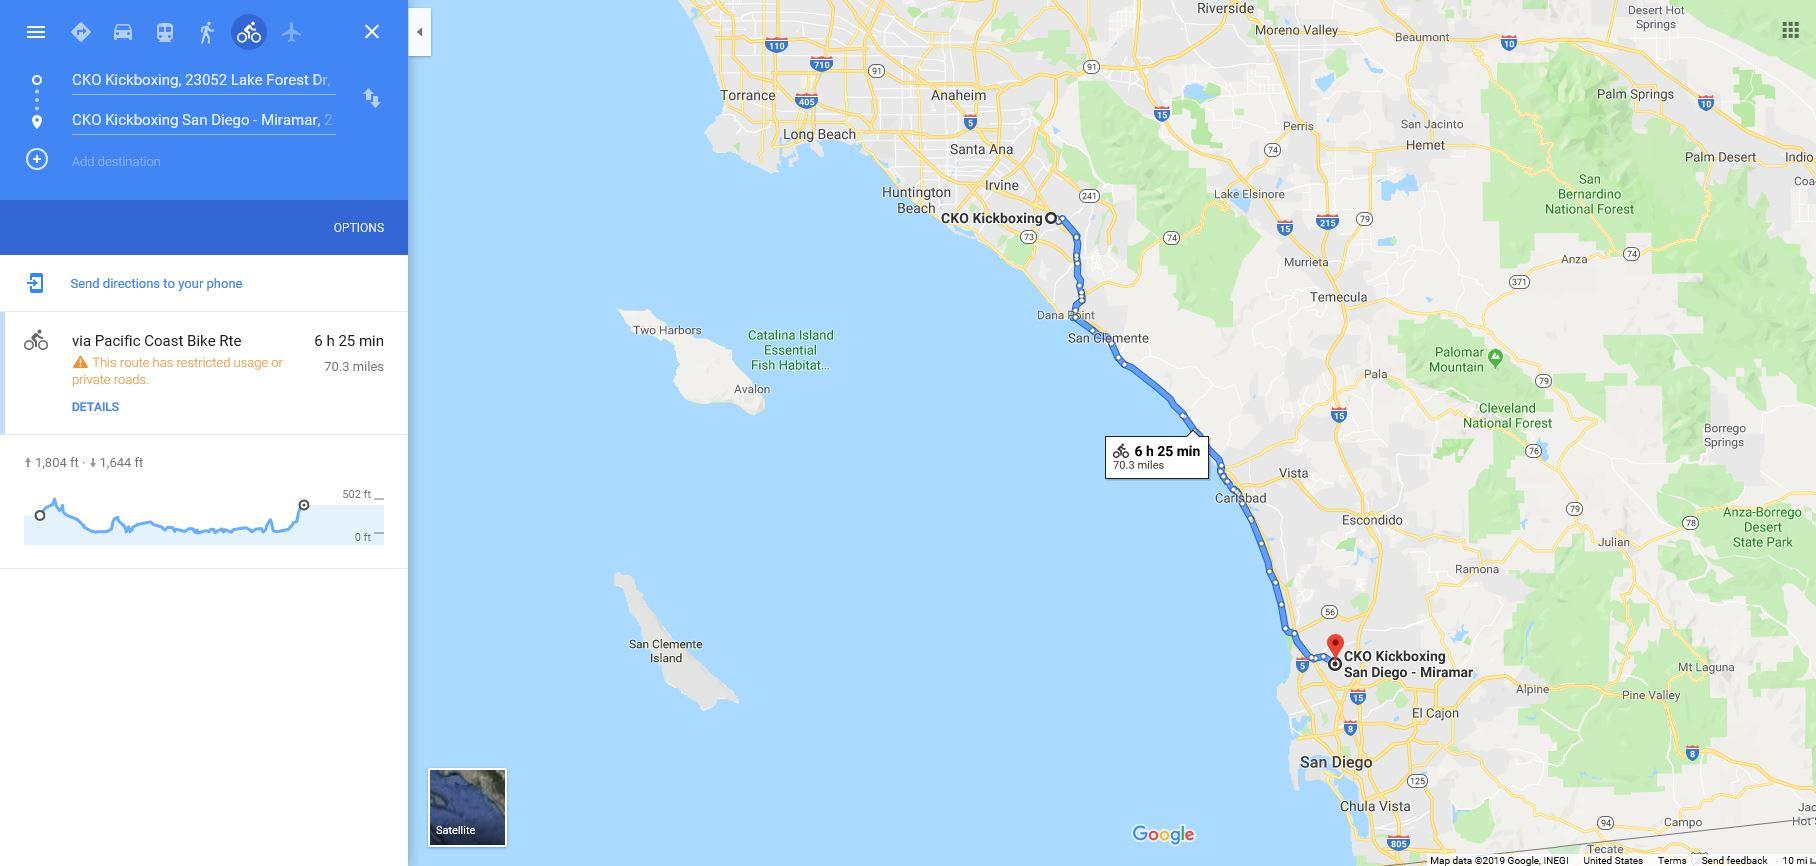 70 Mile Bike Ride - checkpointsCKO Laguna Hills 130pmCKO Miramar 9pm